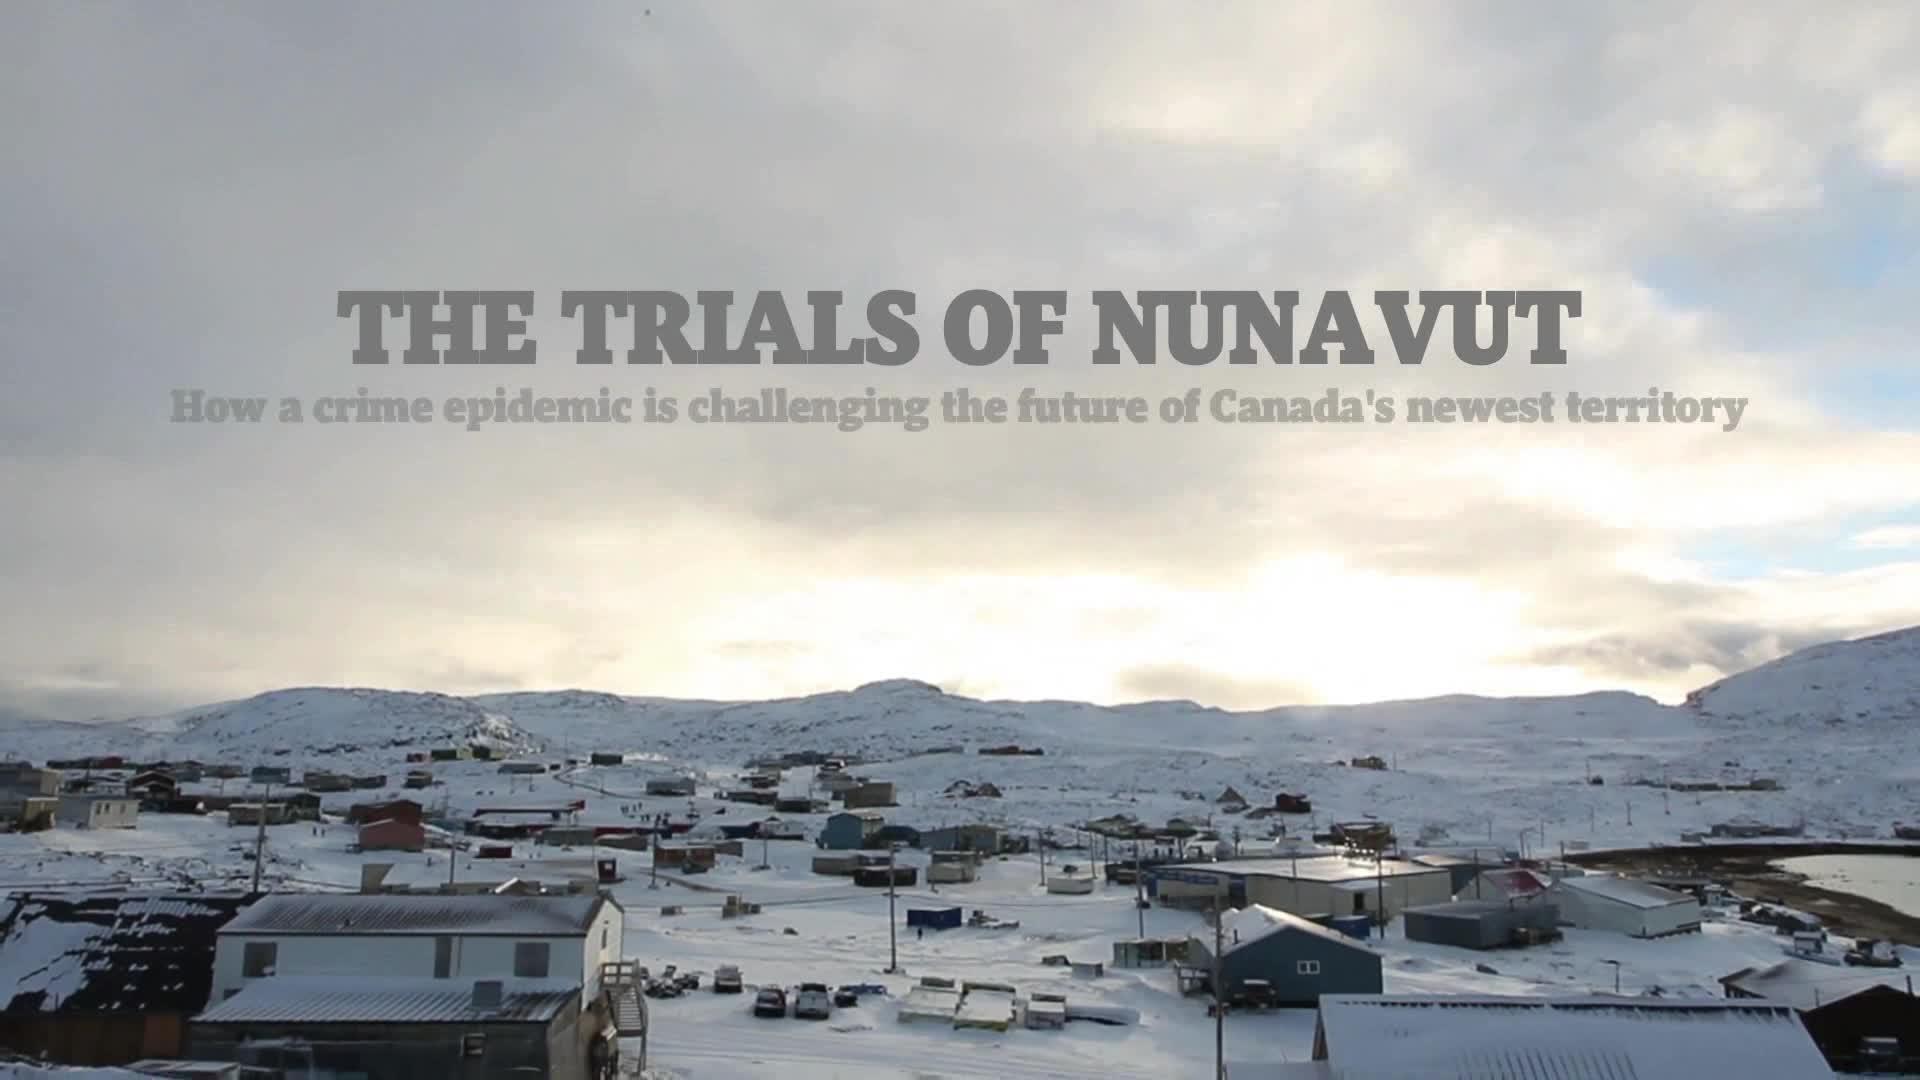 Nominee - The Trials of Nunavut